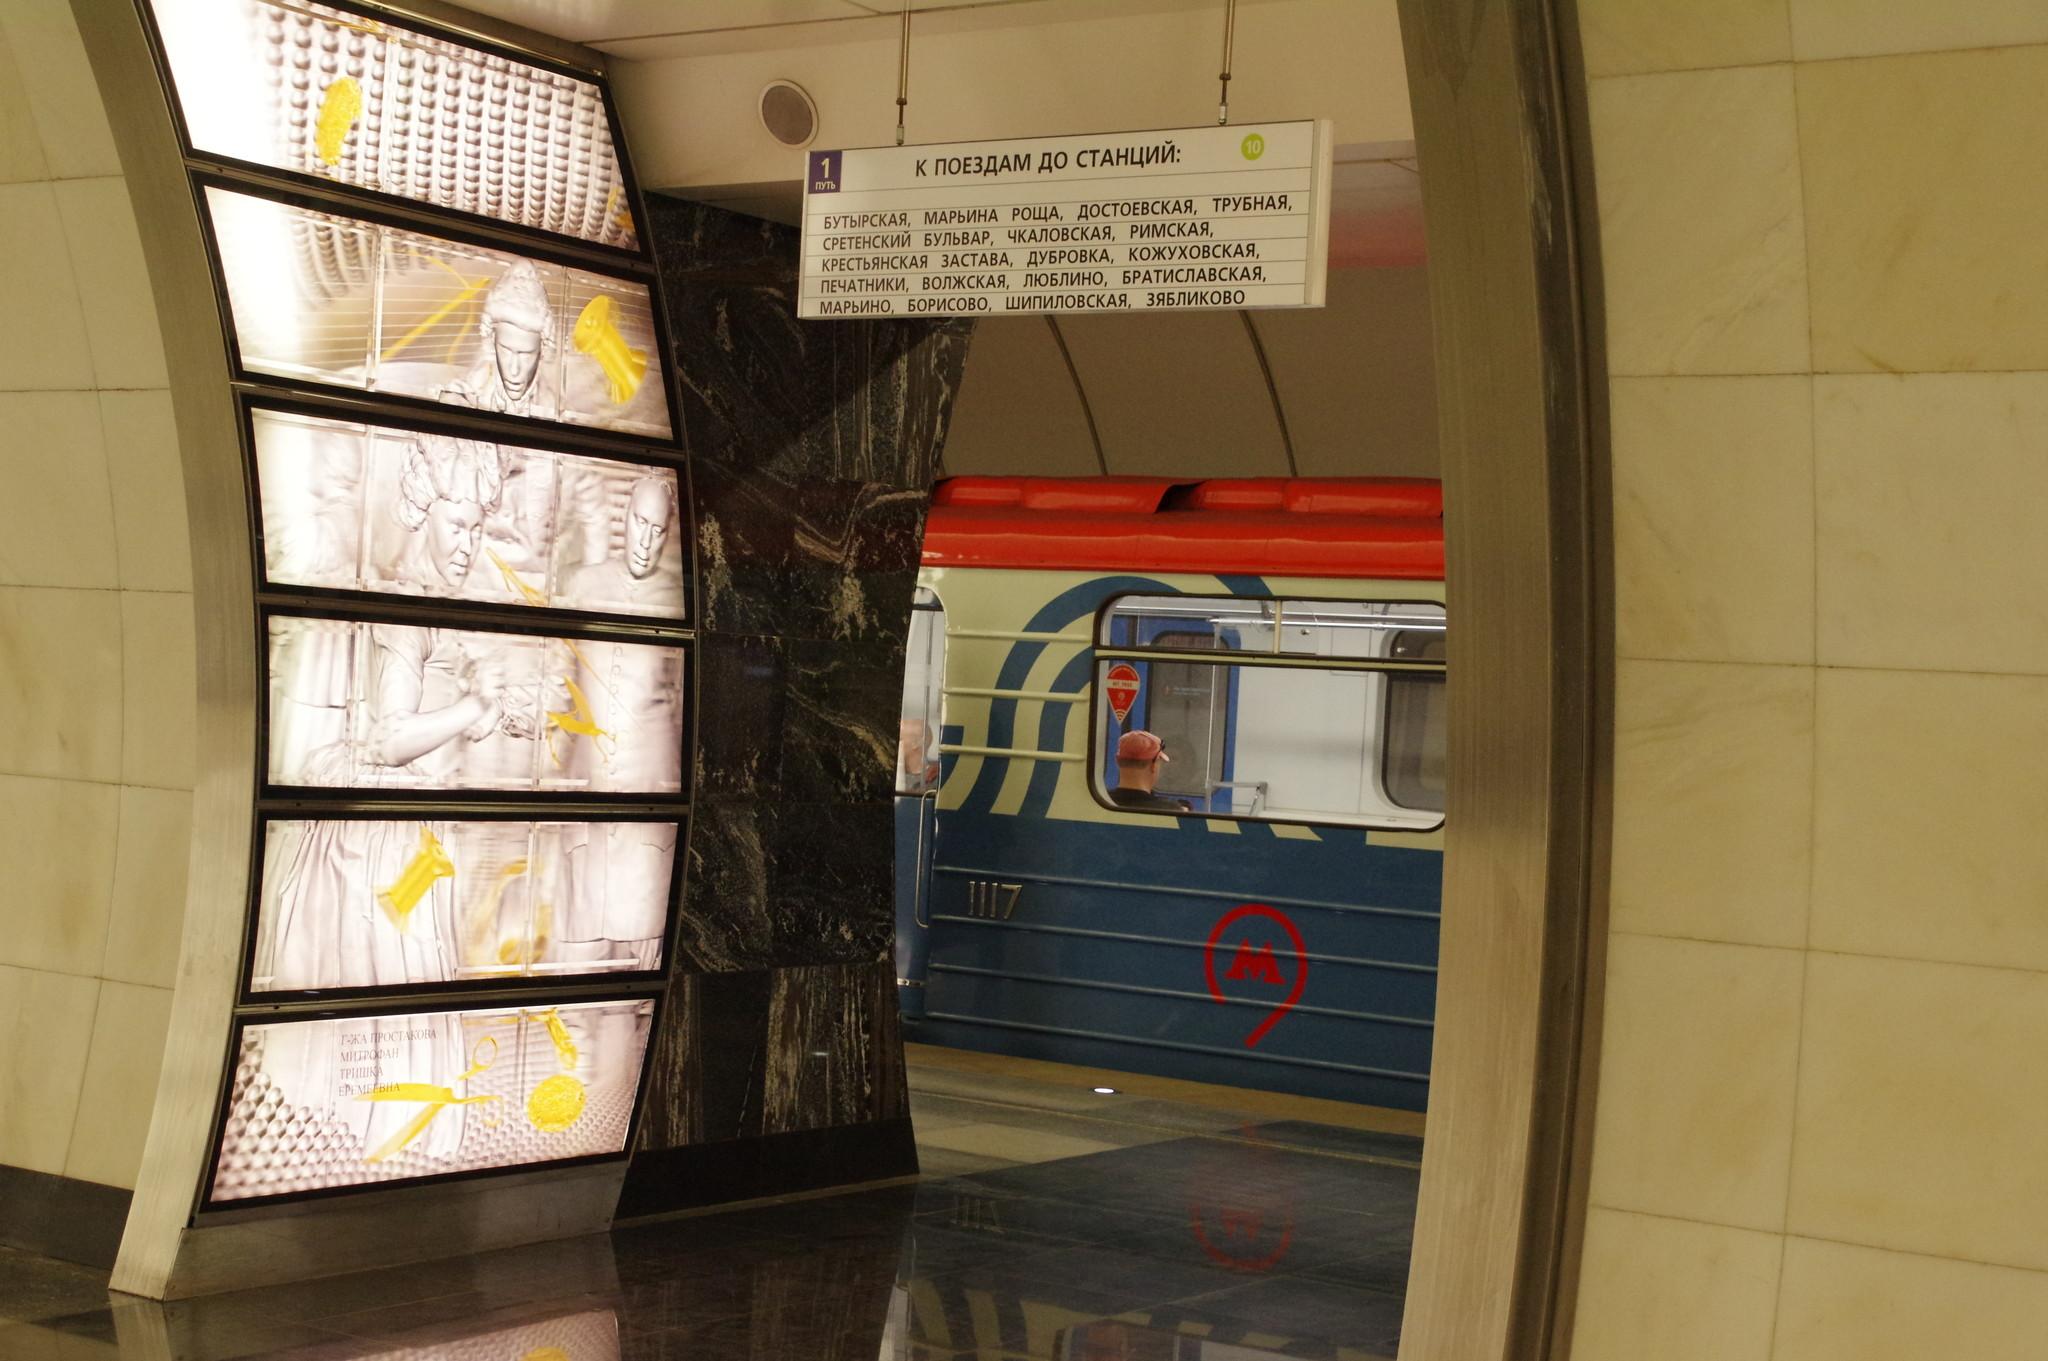 Вагон с номером 1117 на станции «Фонвизинская» Люблинско-Дмитровской линии Московского метрополитена